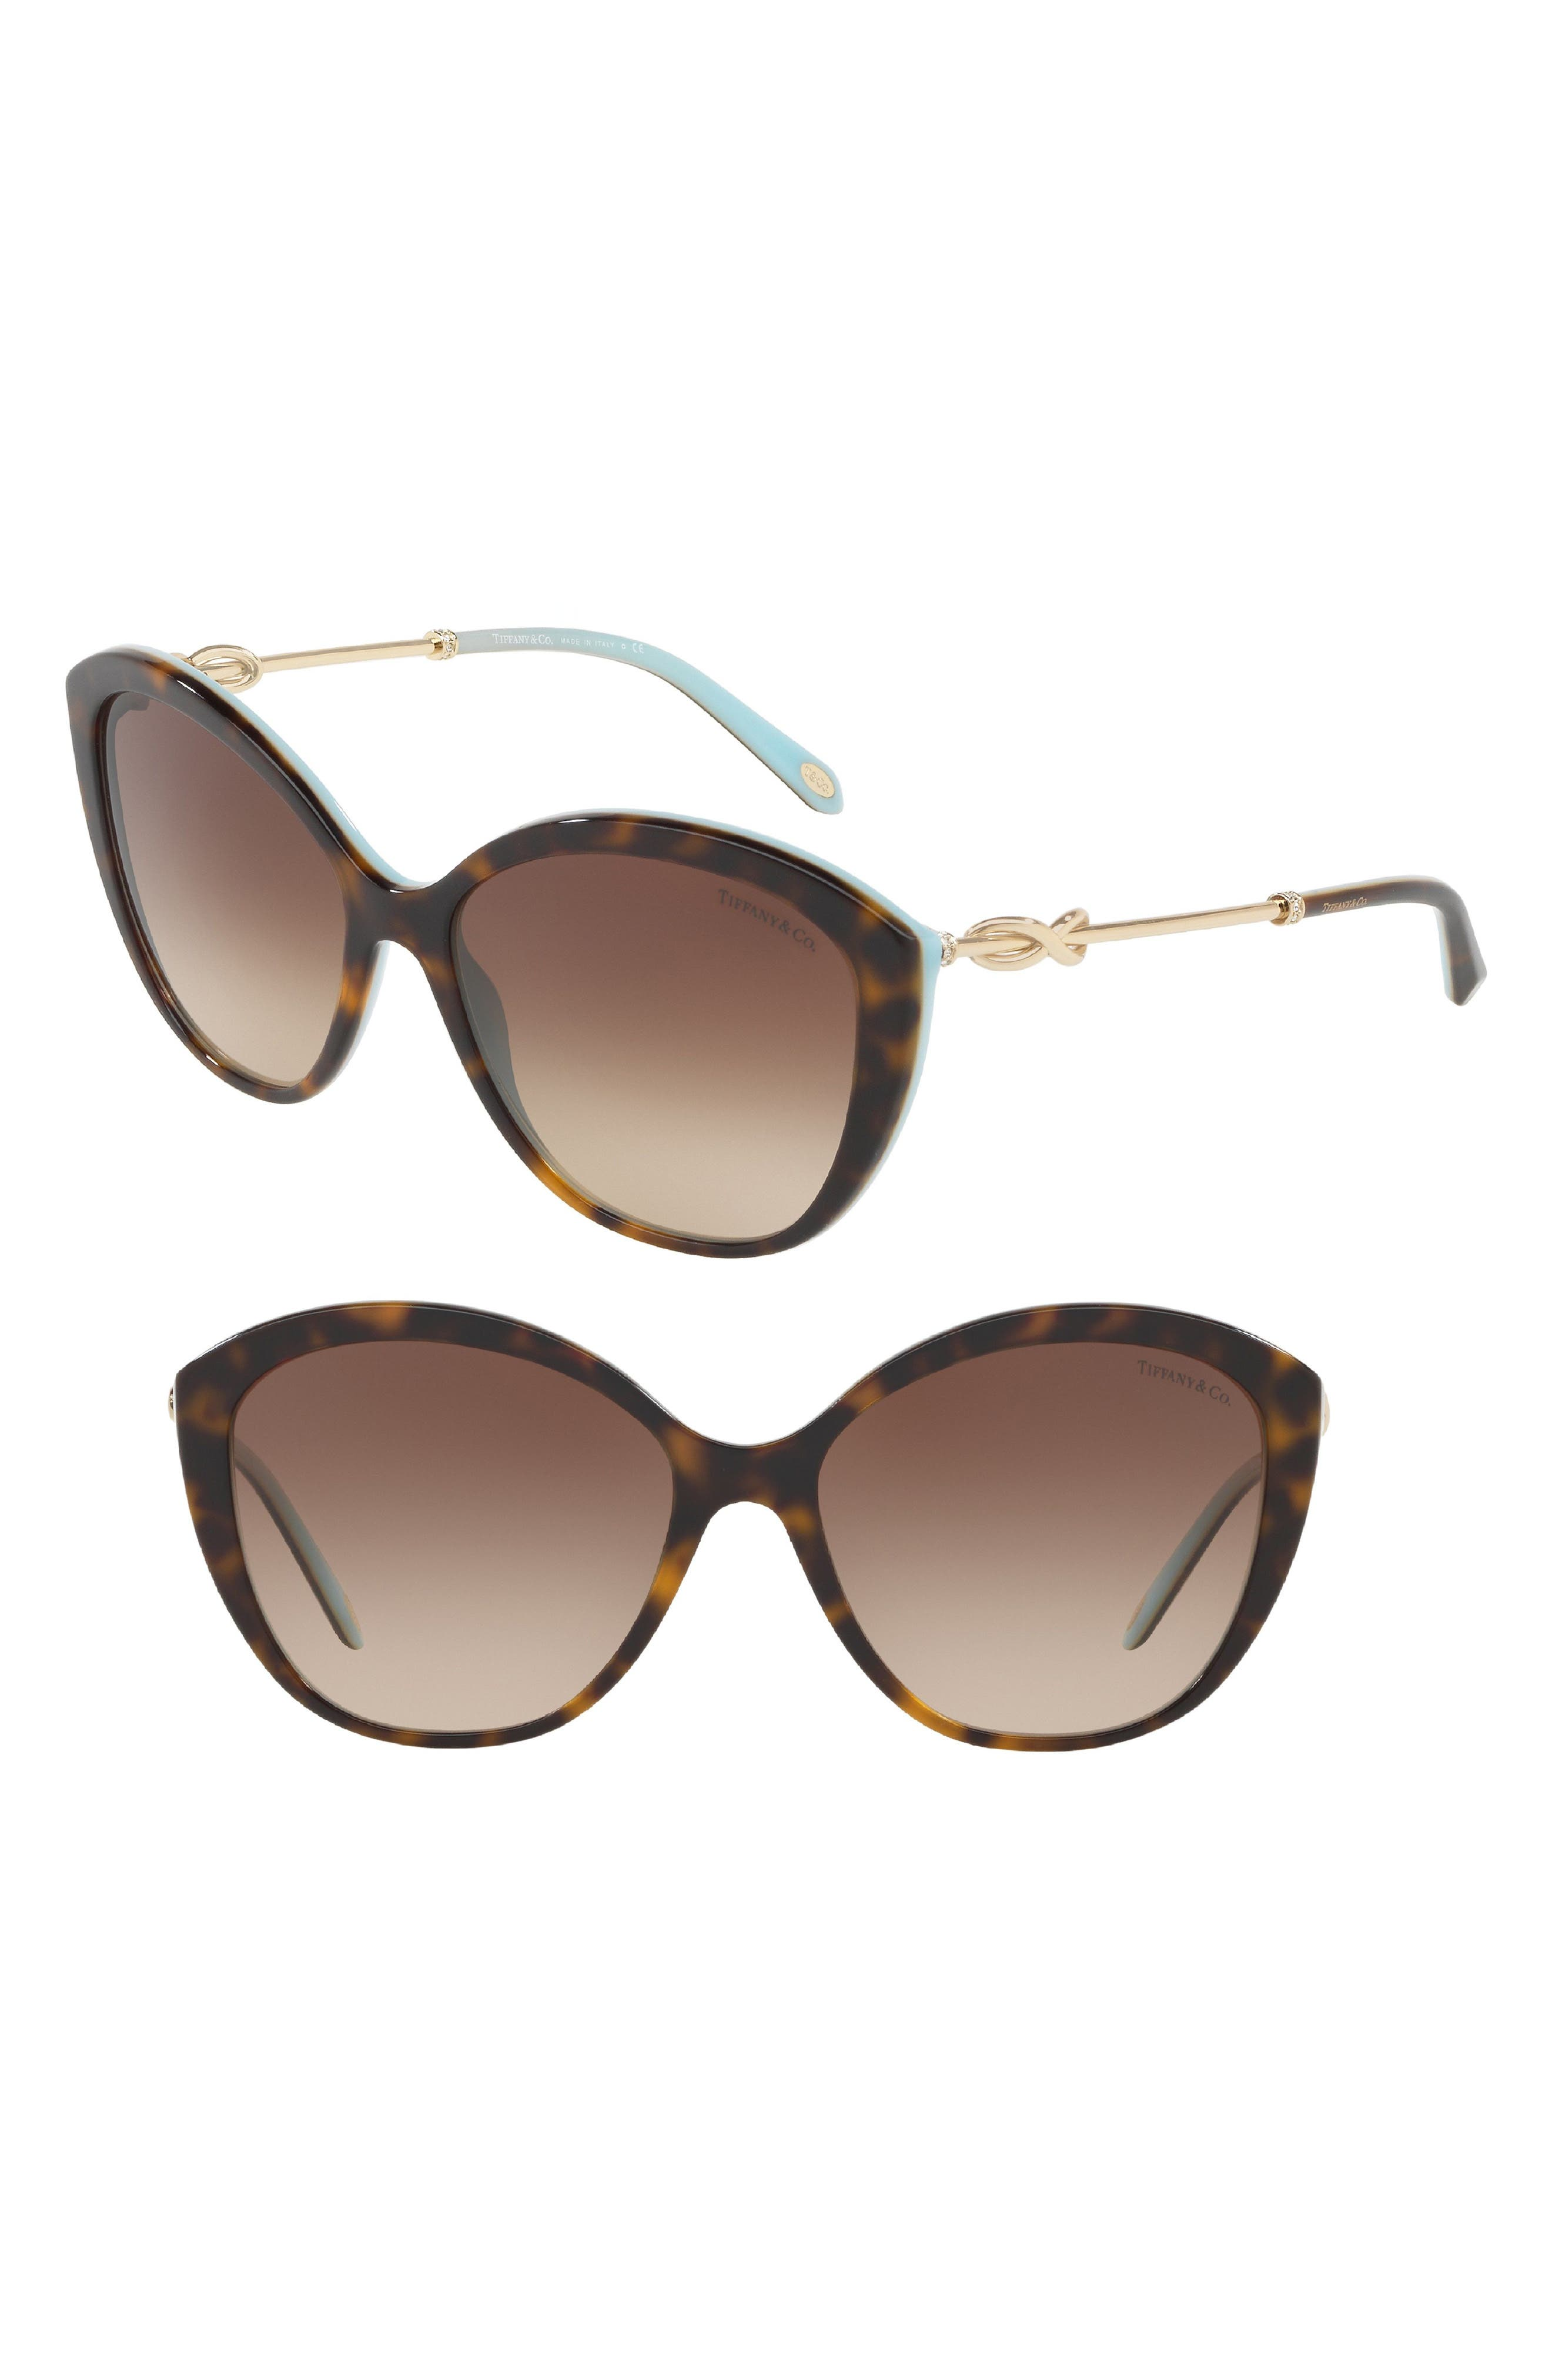 Tiffany 57mm Cat Eye Sunglasses,                             Main thumbnail 1, color,                             Blue Havana Gradient